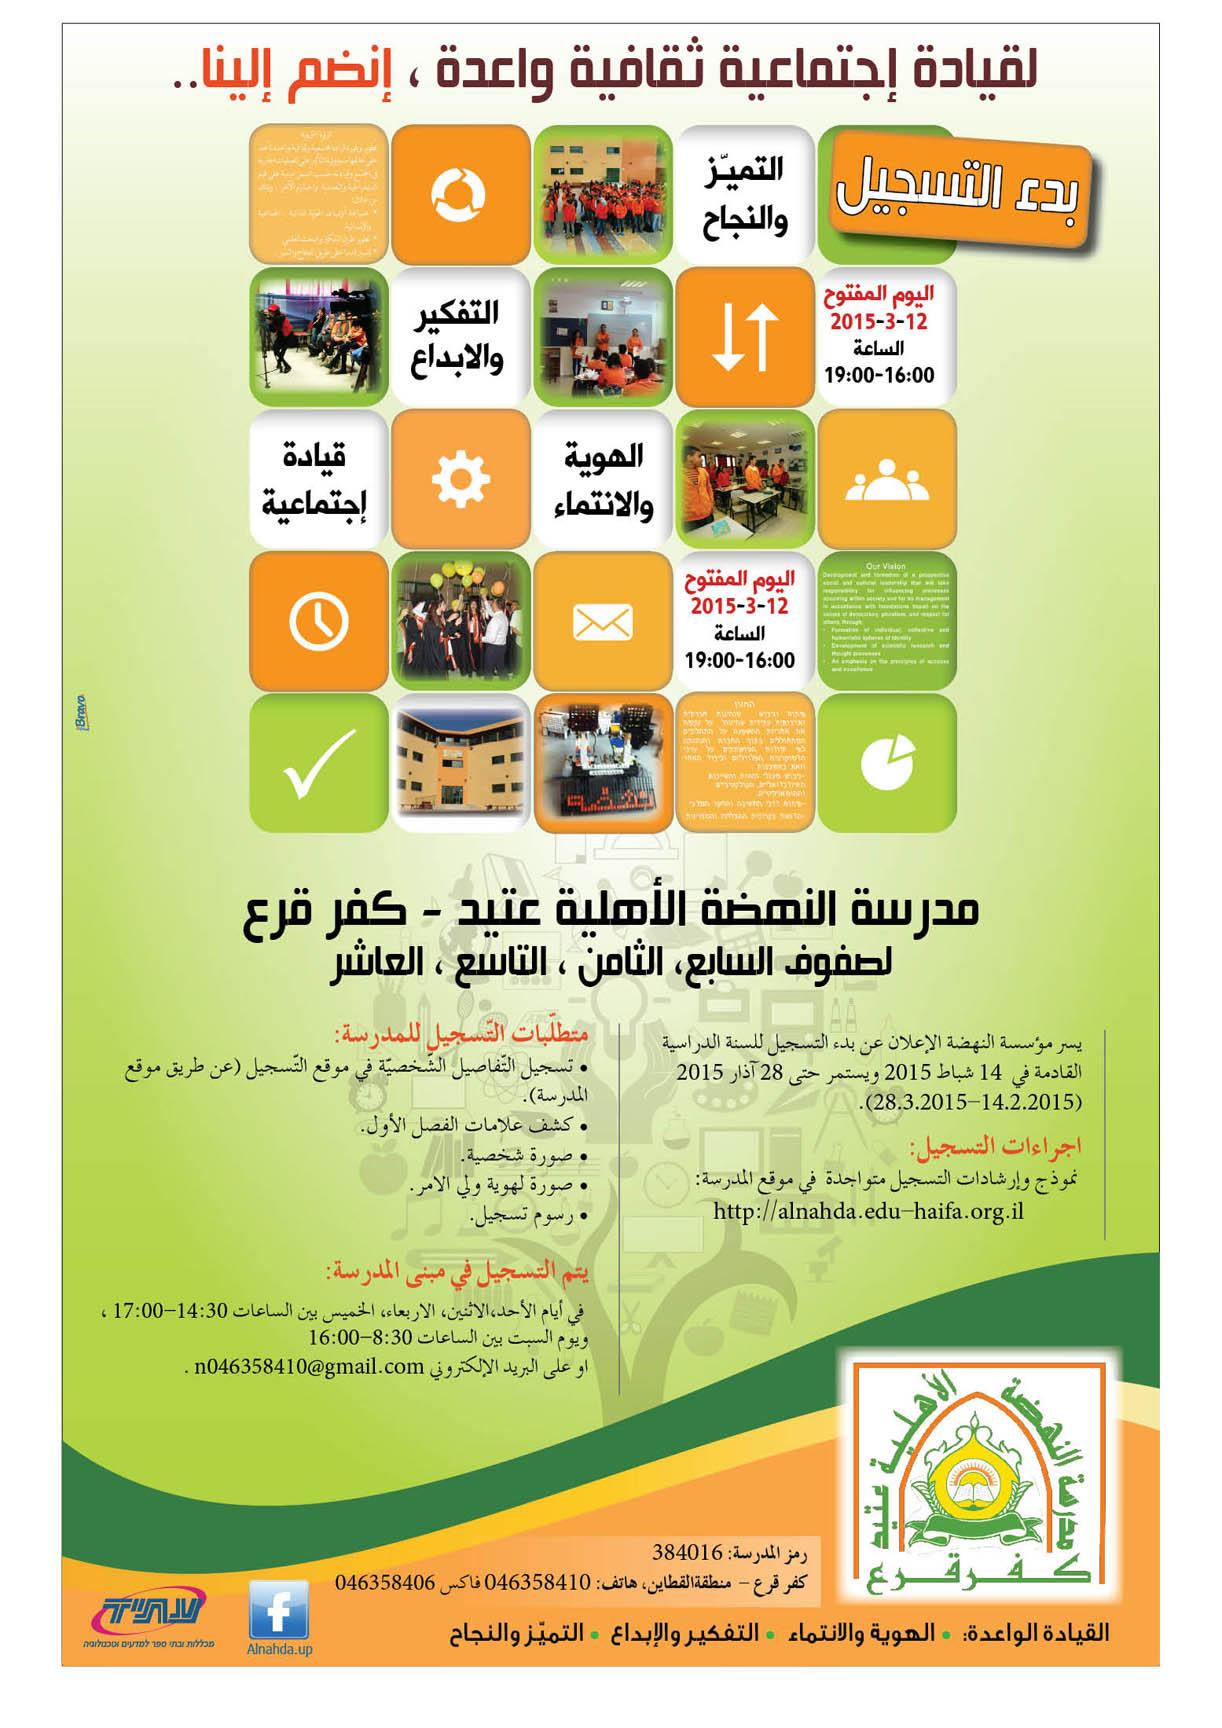 http://www.alnahdasys.com/